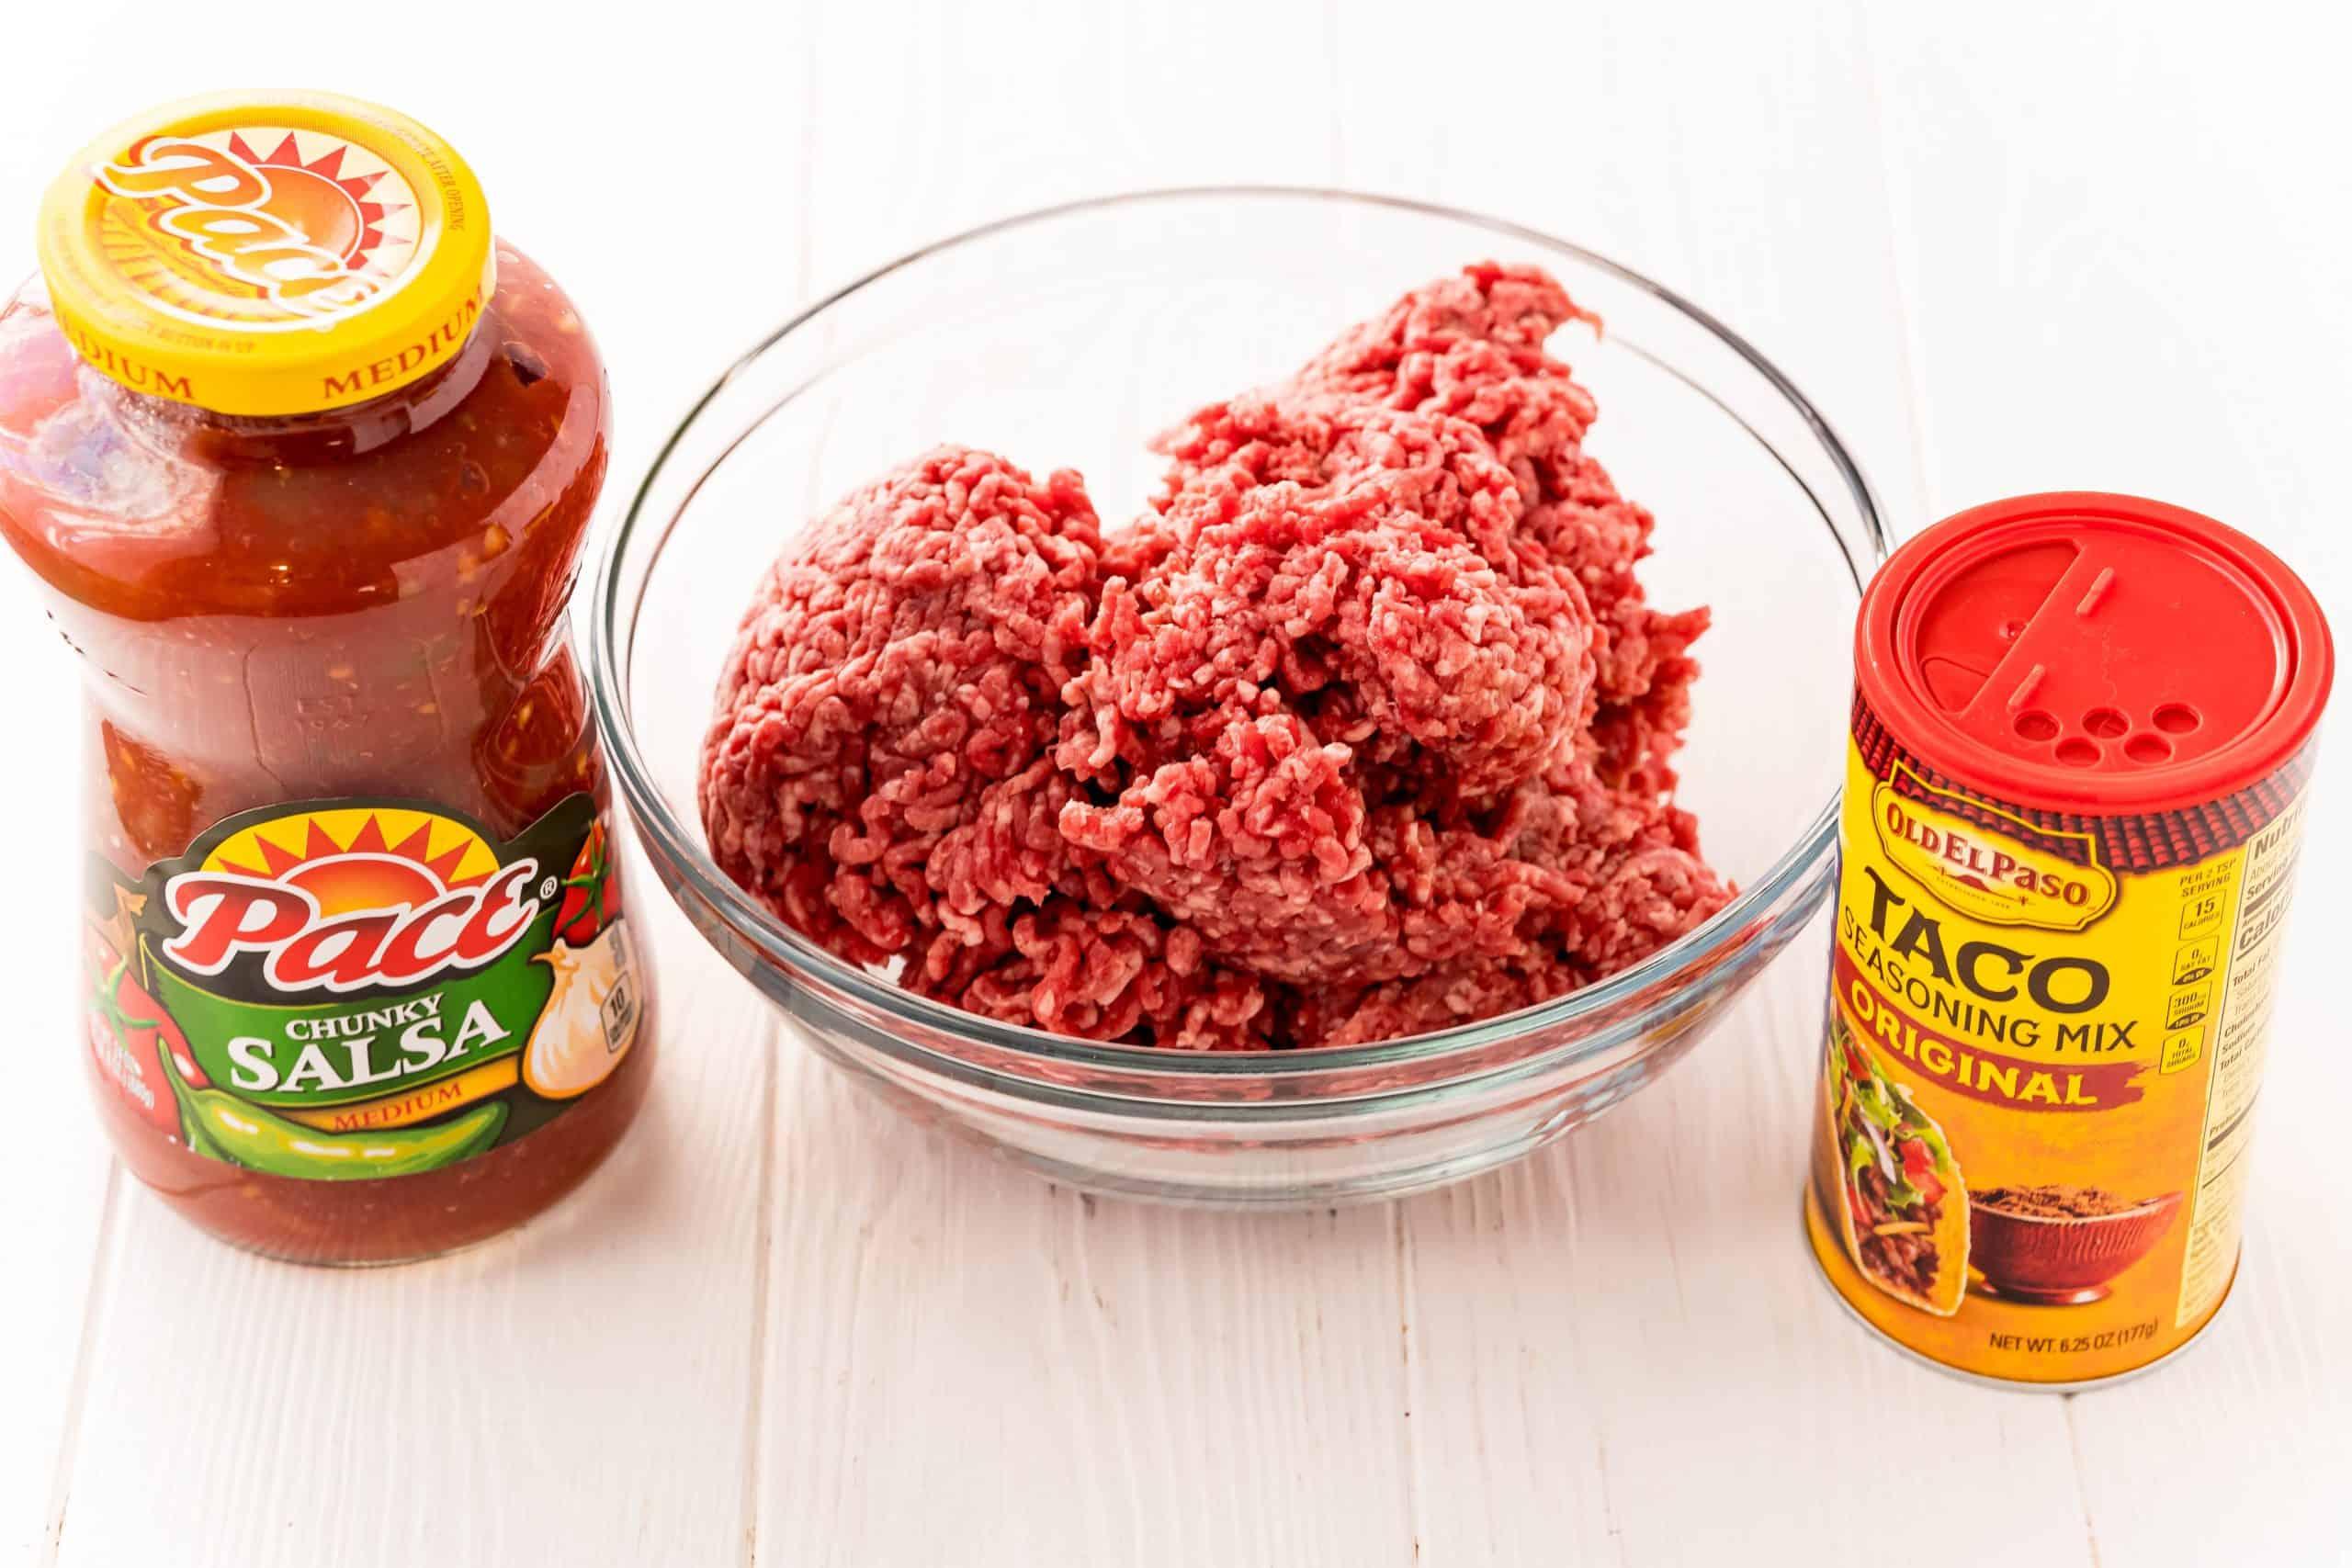 Ingredients needed: ground beef, salsa and taco seasoning